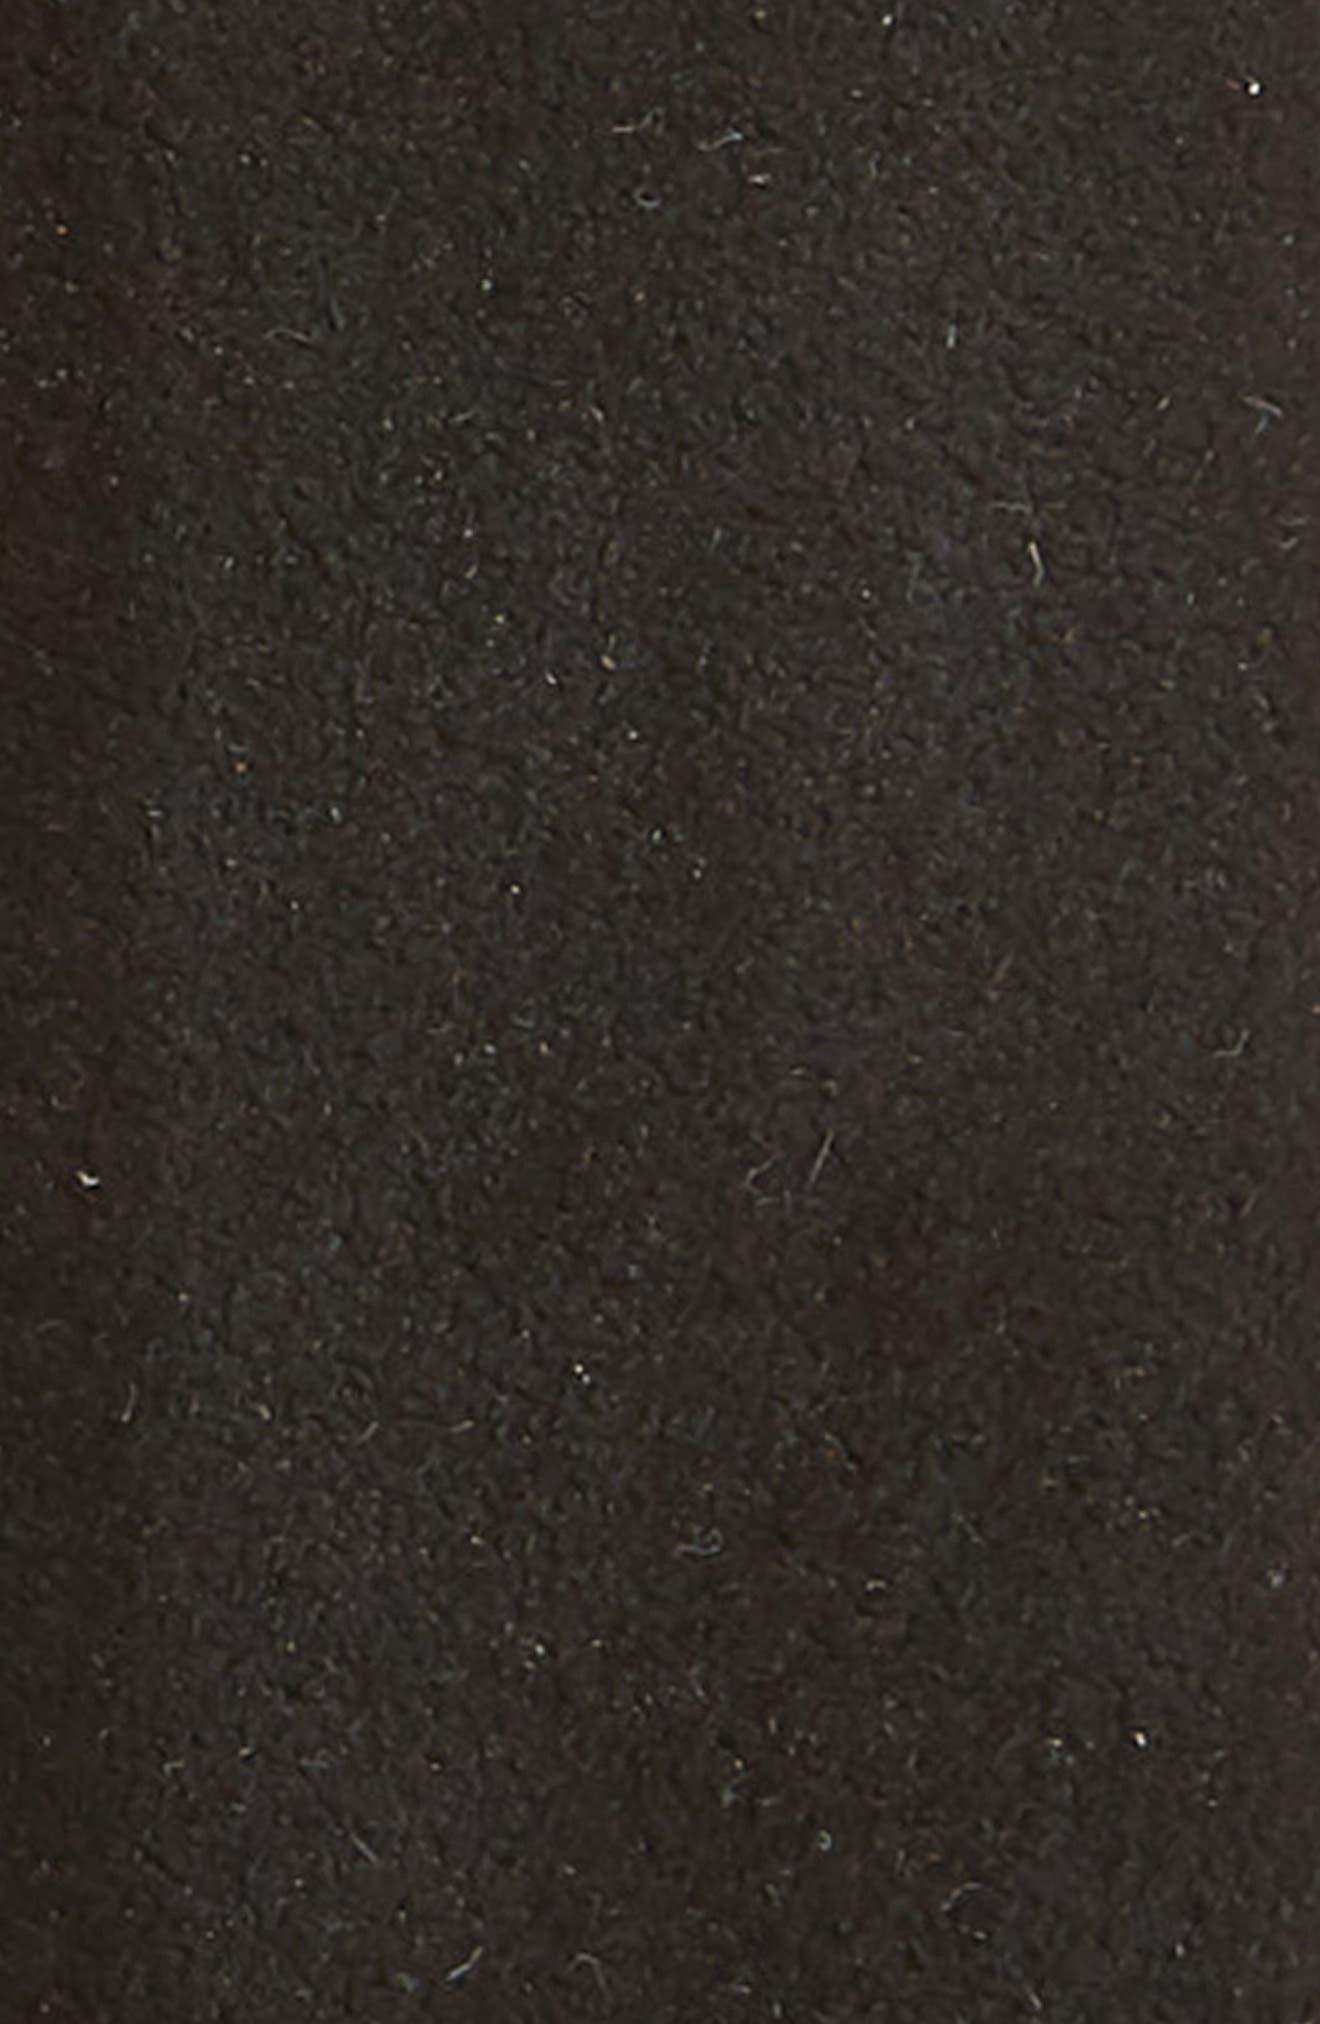 SALVATORE FERRAGAMO, Suede Leather Belt, Alternate thumbnail 2, color, NERO